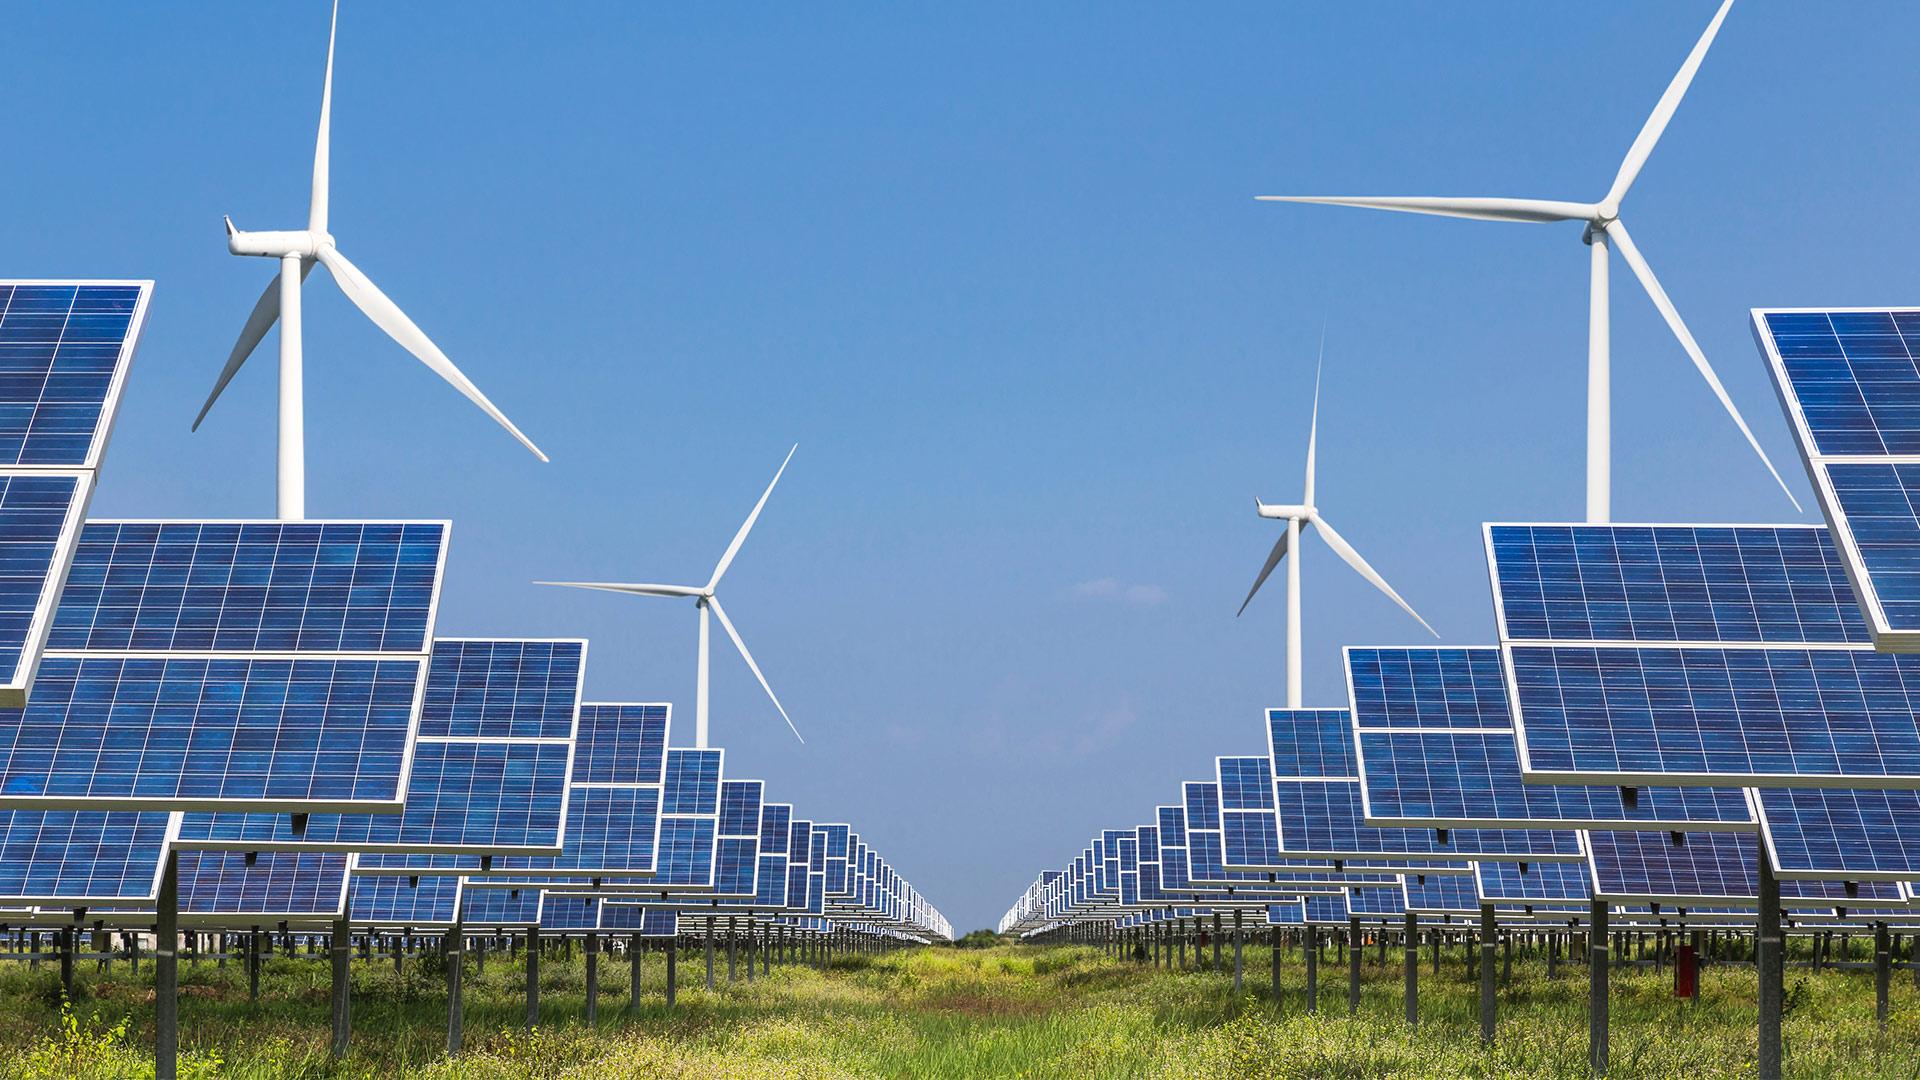 Solar panel and wind farm